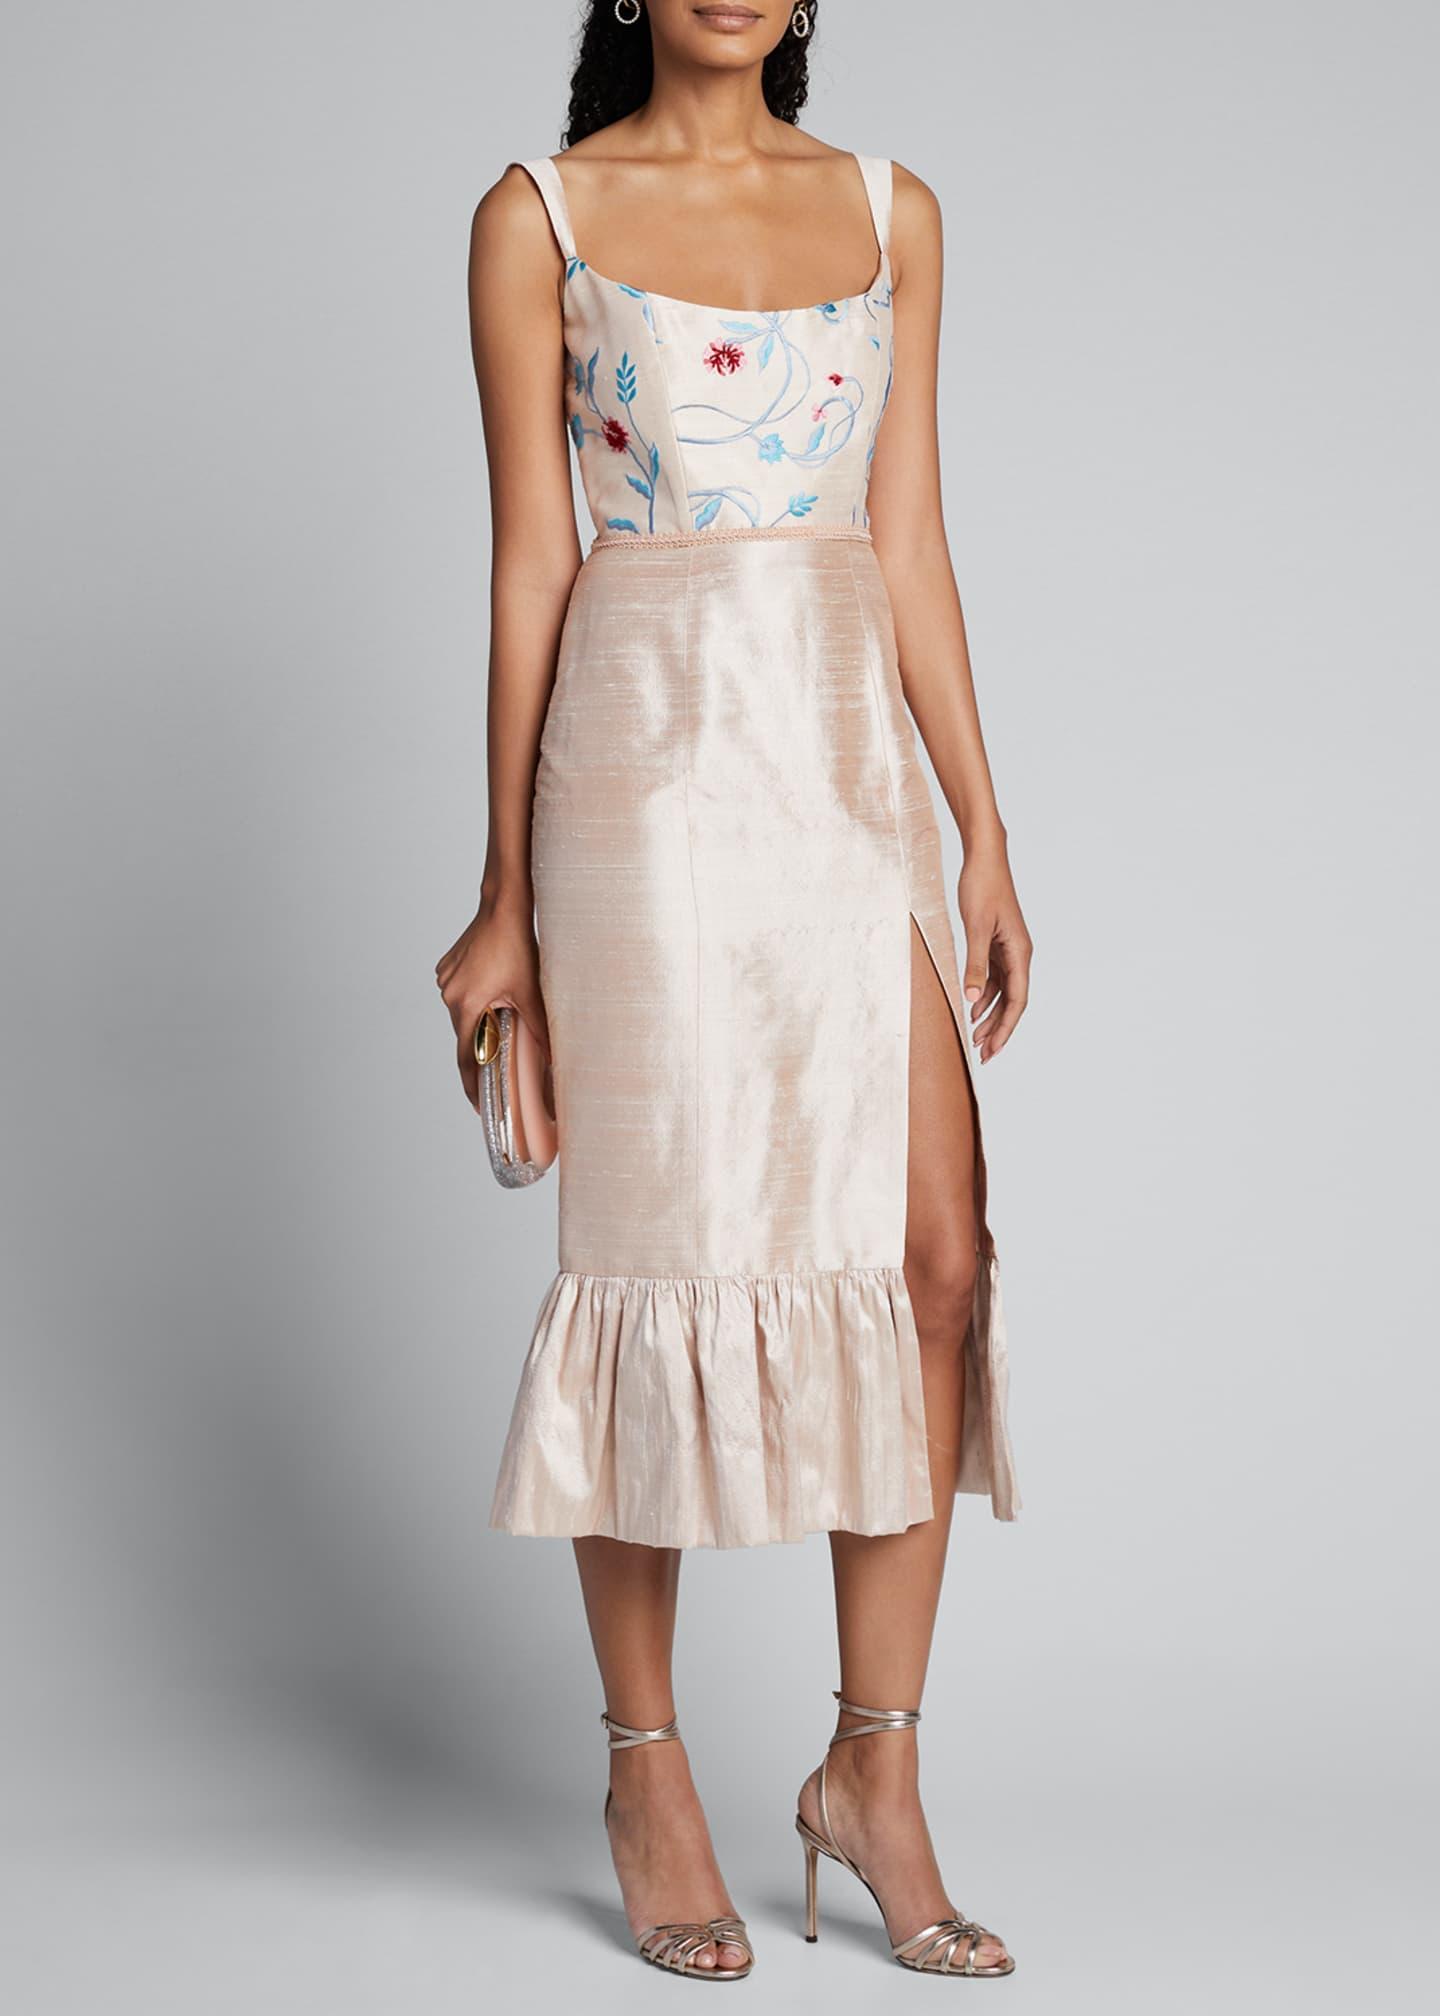 Markarian Floral Embroidered Silk Twill Ruffle Hem Dress